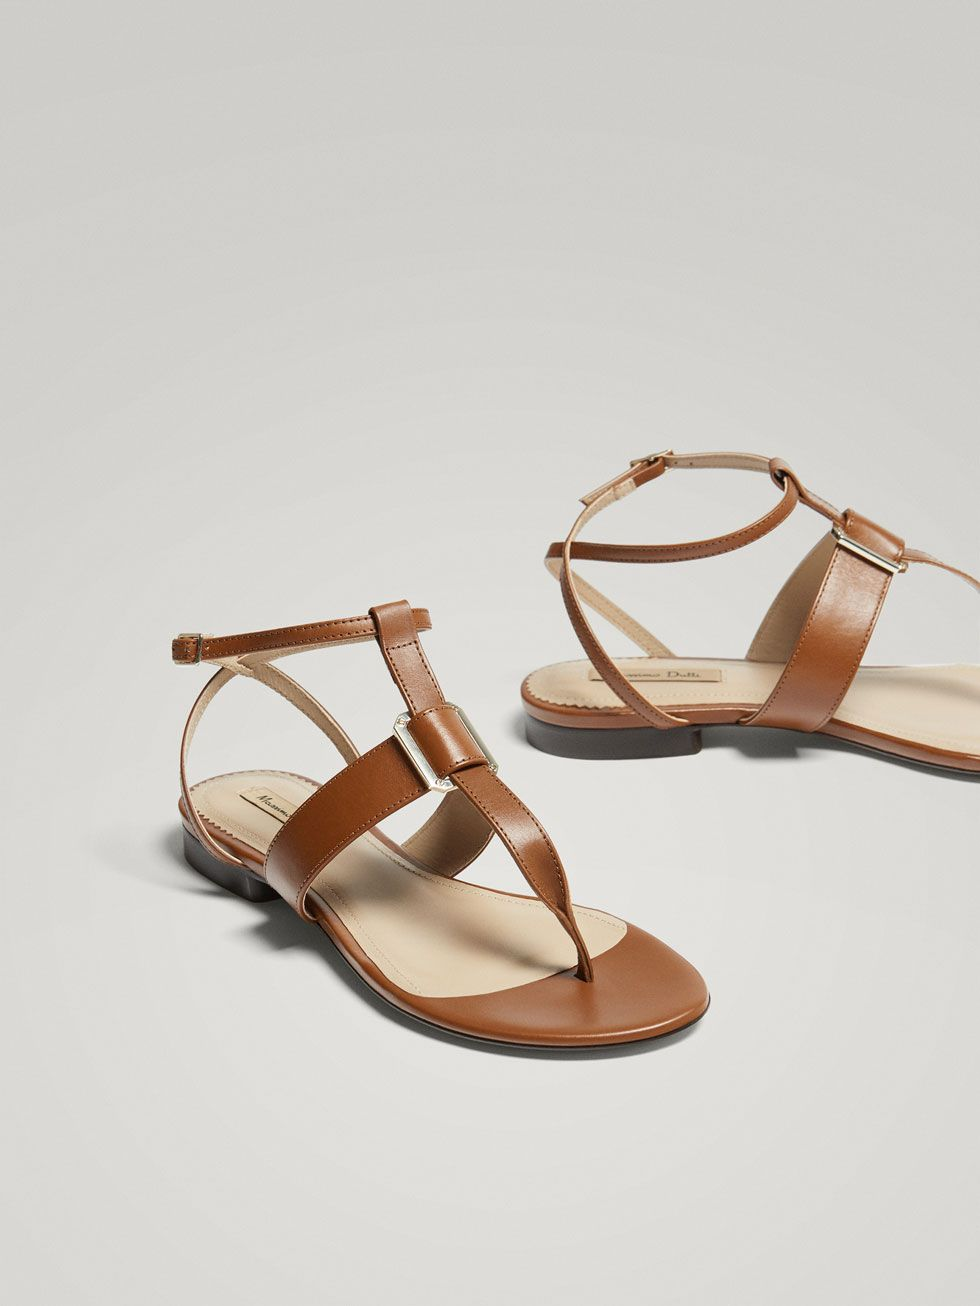 Mujer Ver Todo Dutti Desde Zapatos 35 Talla Massimo 4RqcAL35jS